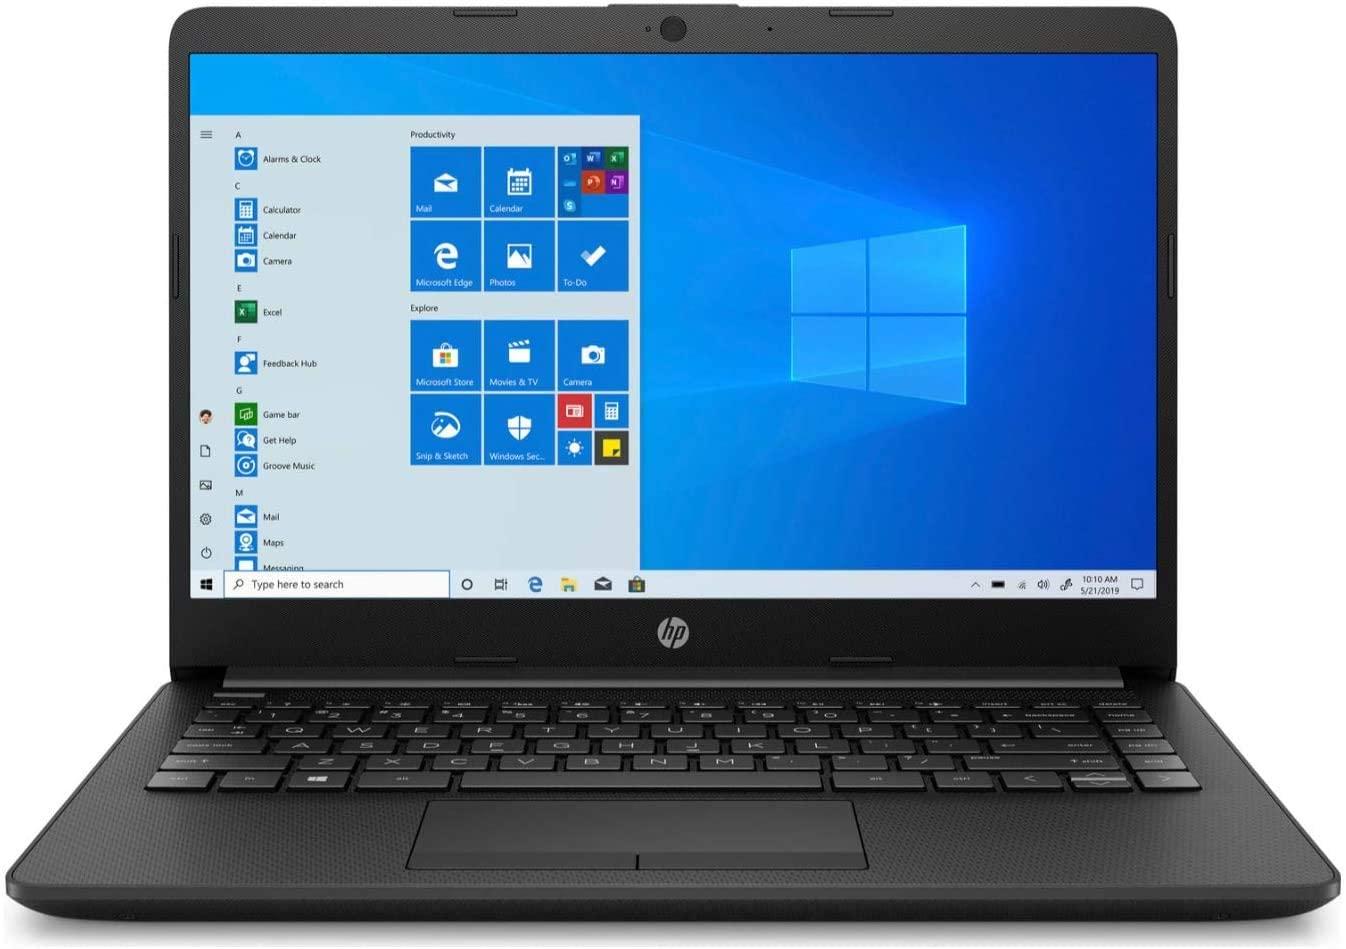 hp business laptop image